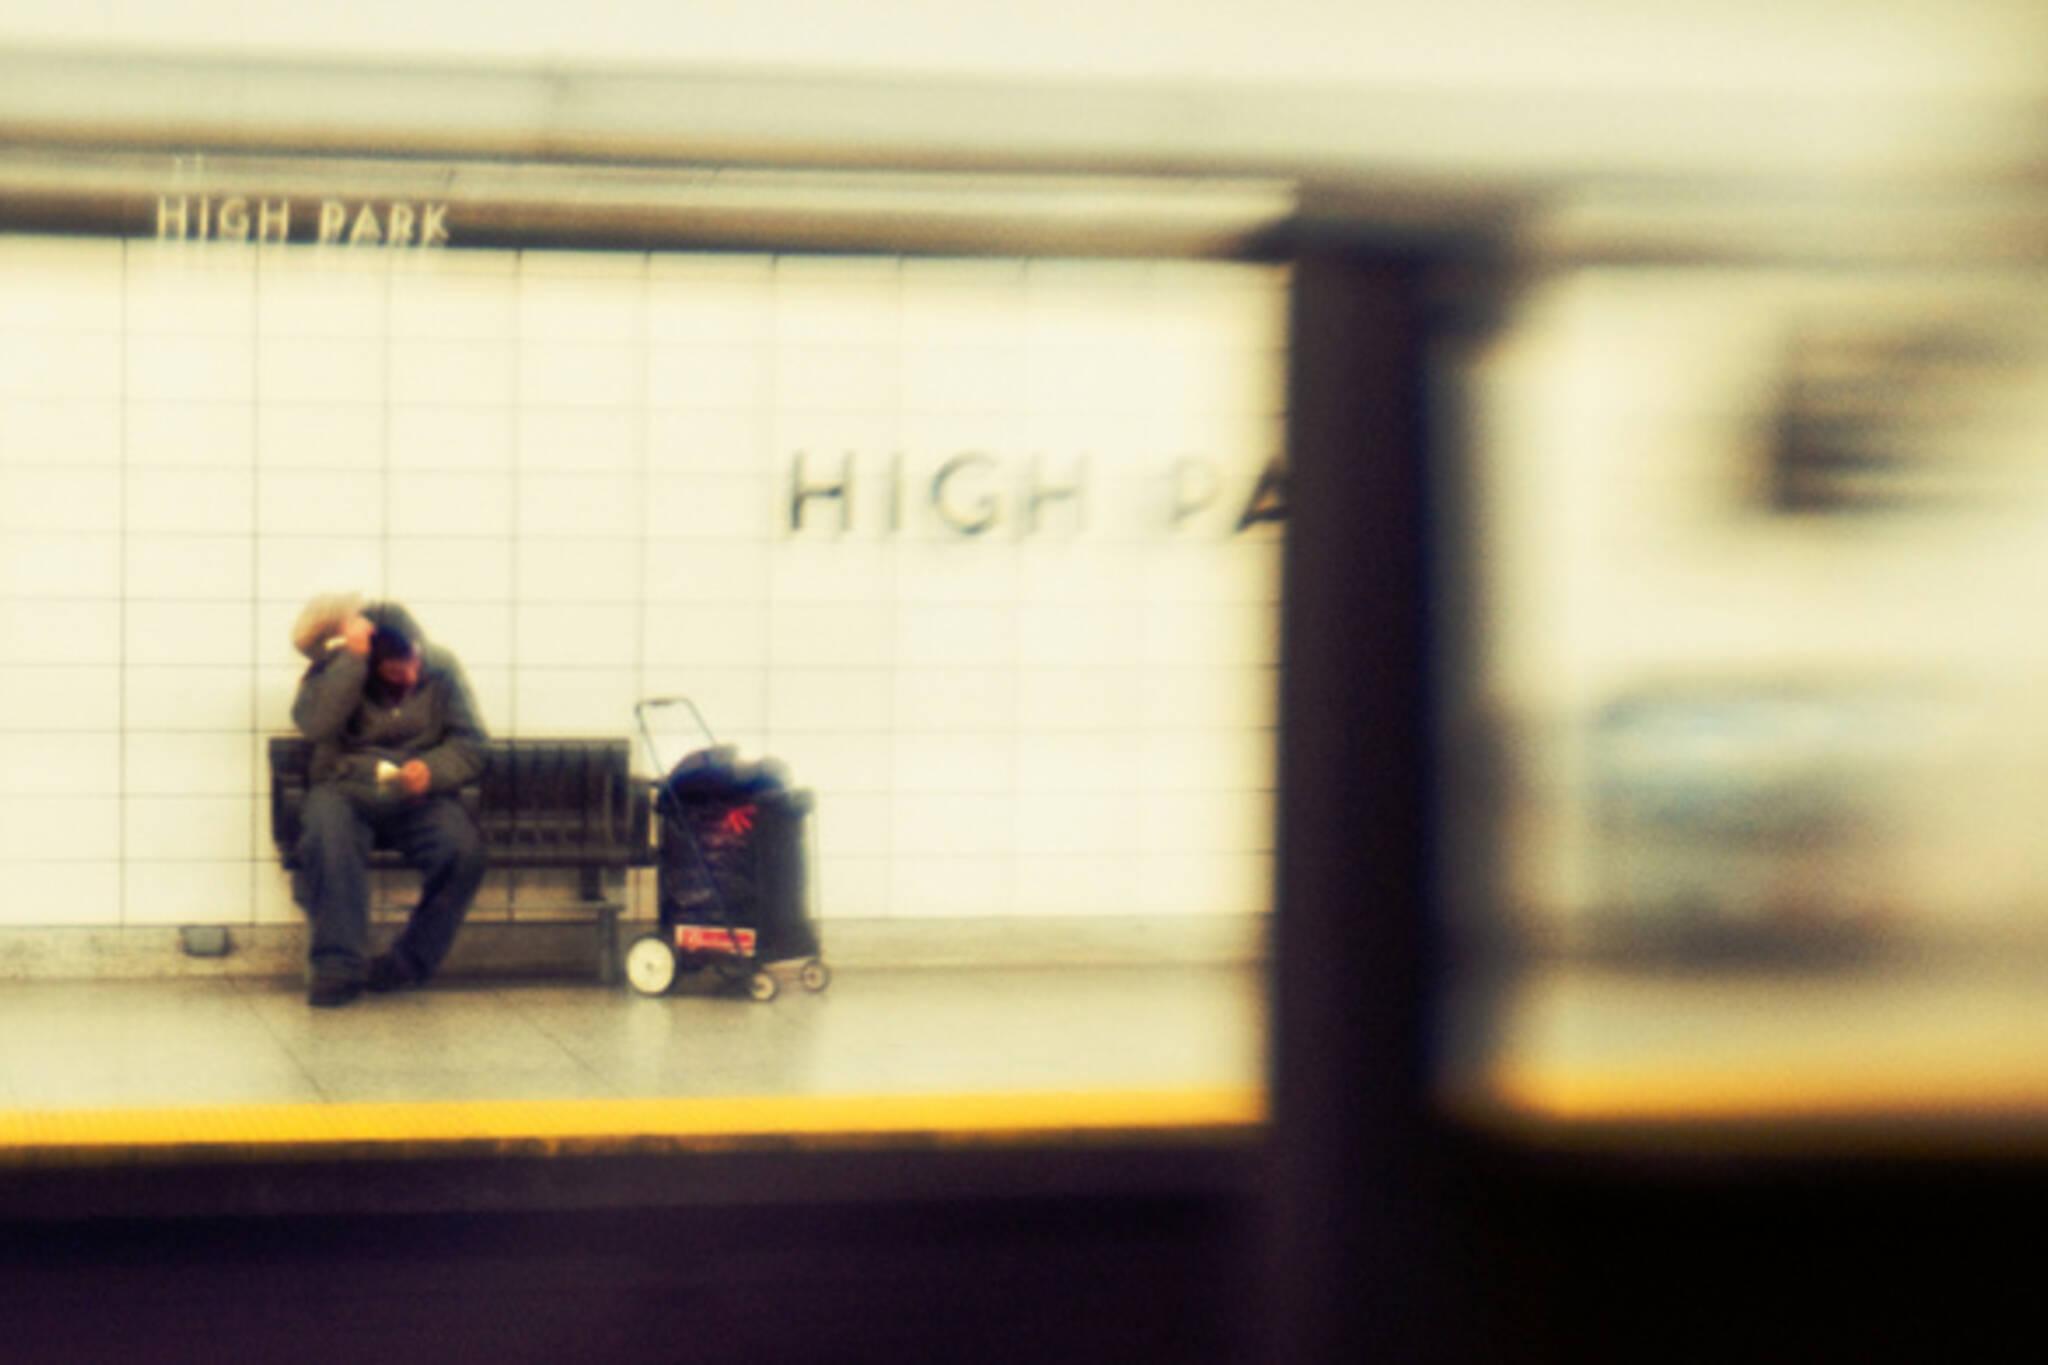 High Park Subway